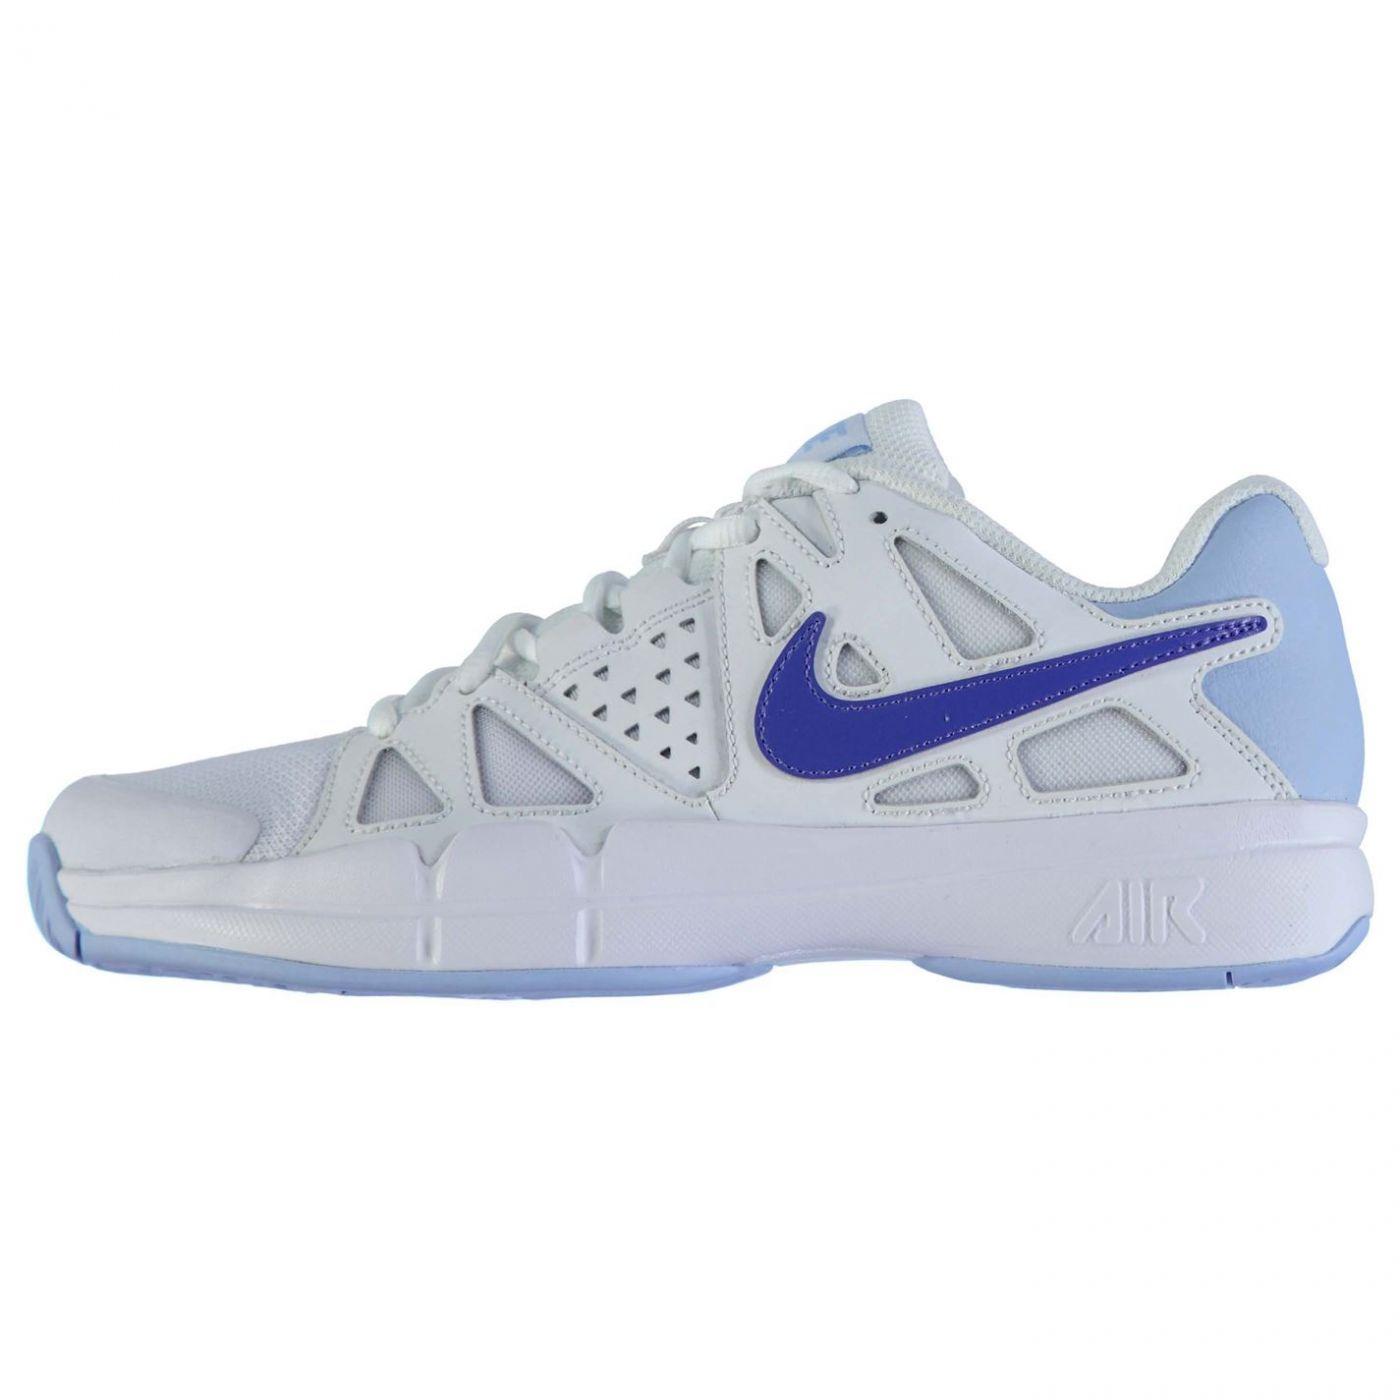 Nike Air Vapor Advantage Tennis Shoes